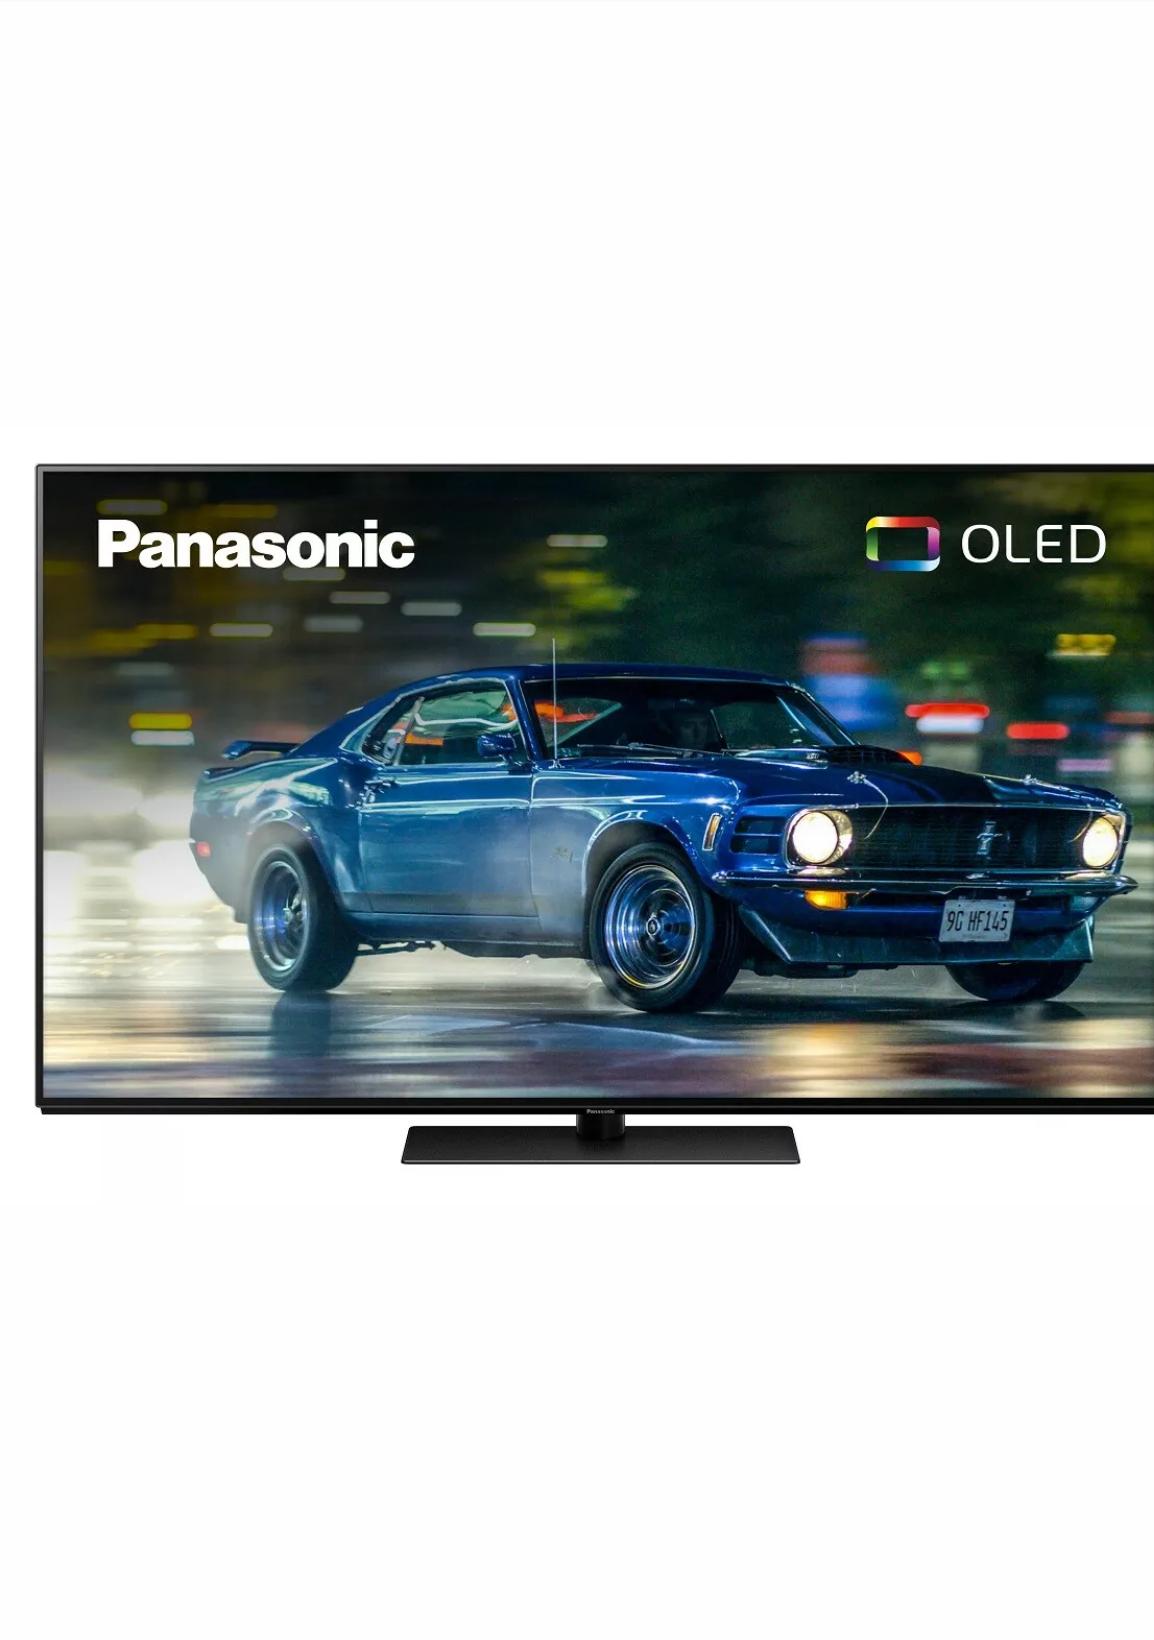 Panasonic TX-55GZ950B 55 Inch SMART 4K Ultra HD HDR OLED TV Freeview Play Refurbished £854.99 @ Panasonic / eBay